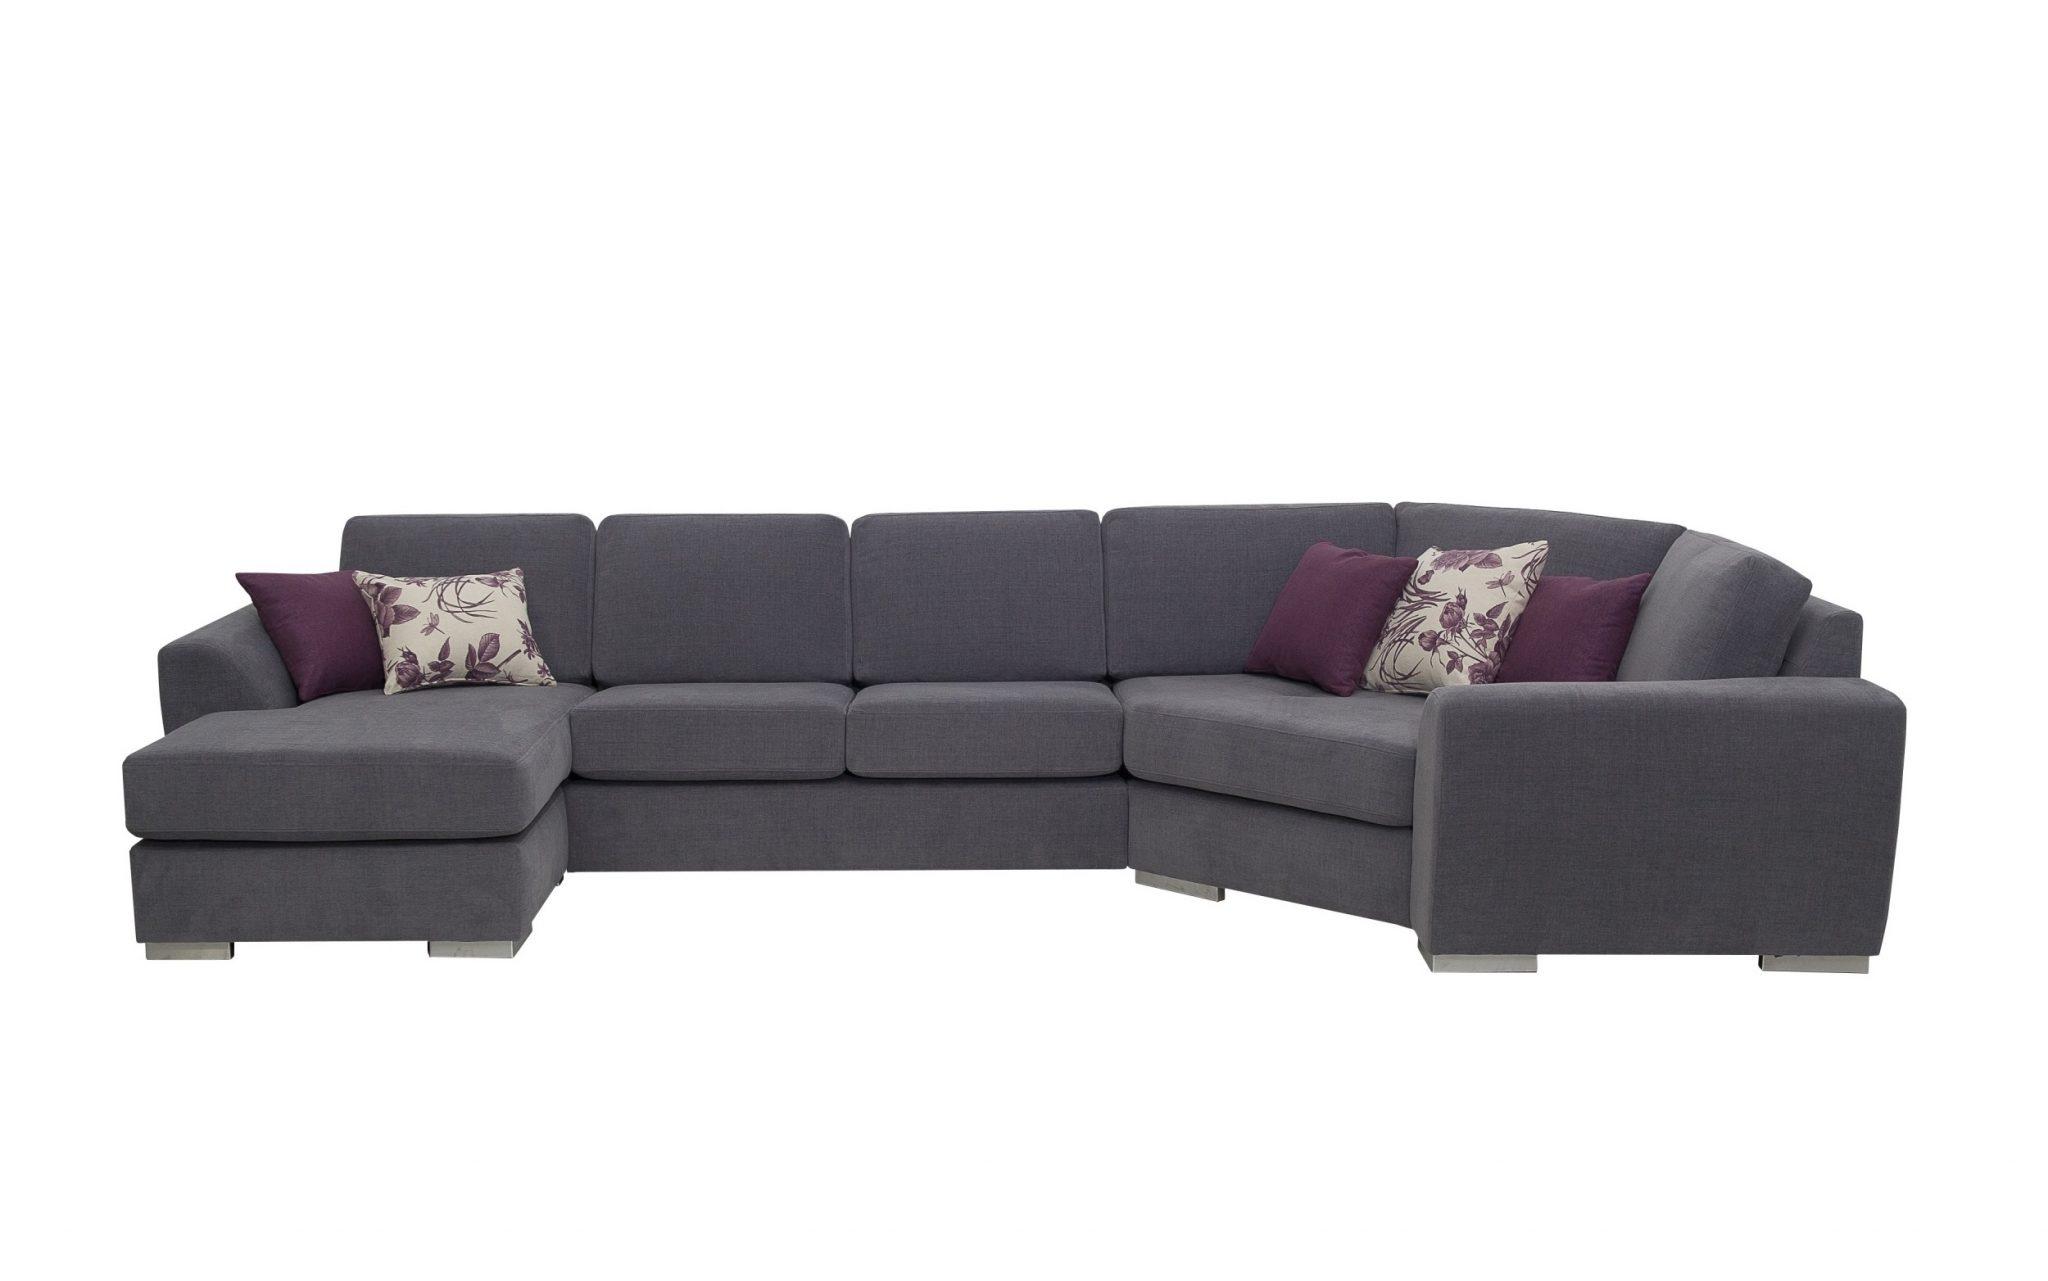 modern living modular sofa scandinavian style softnord (13) - Softnord